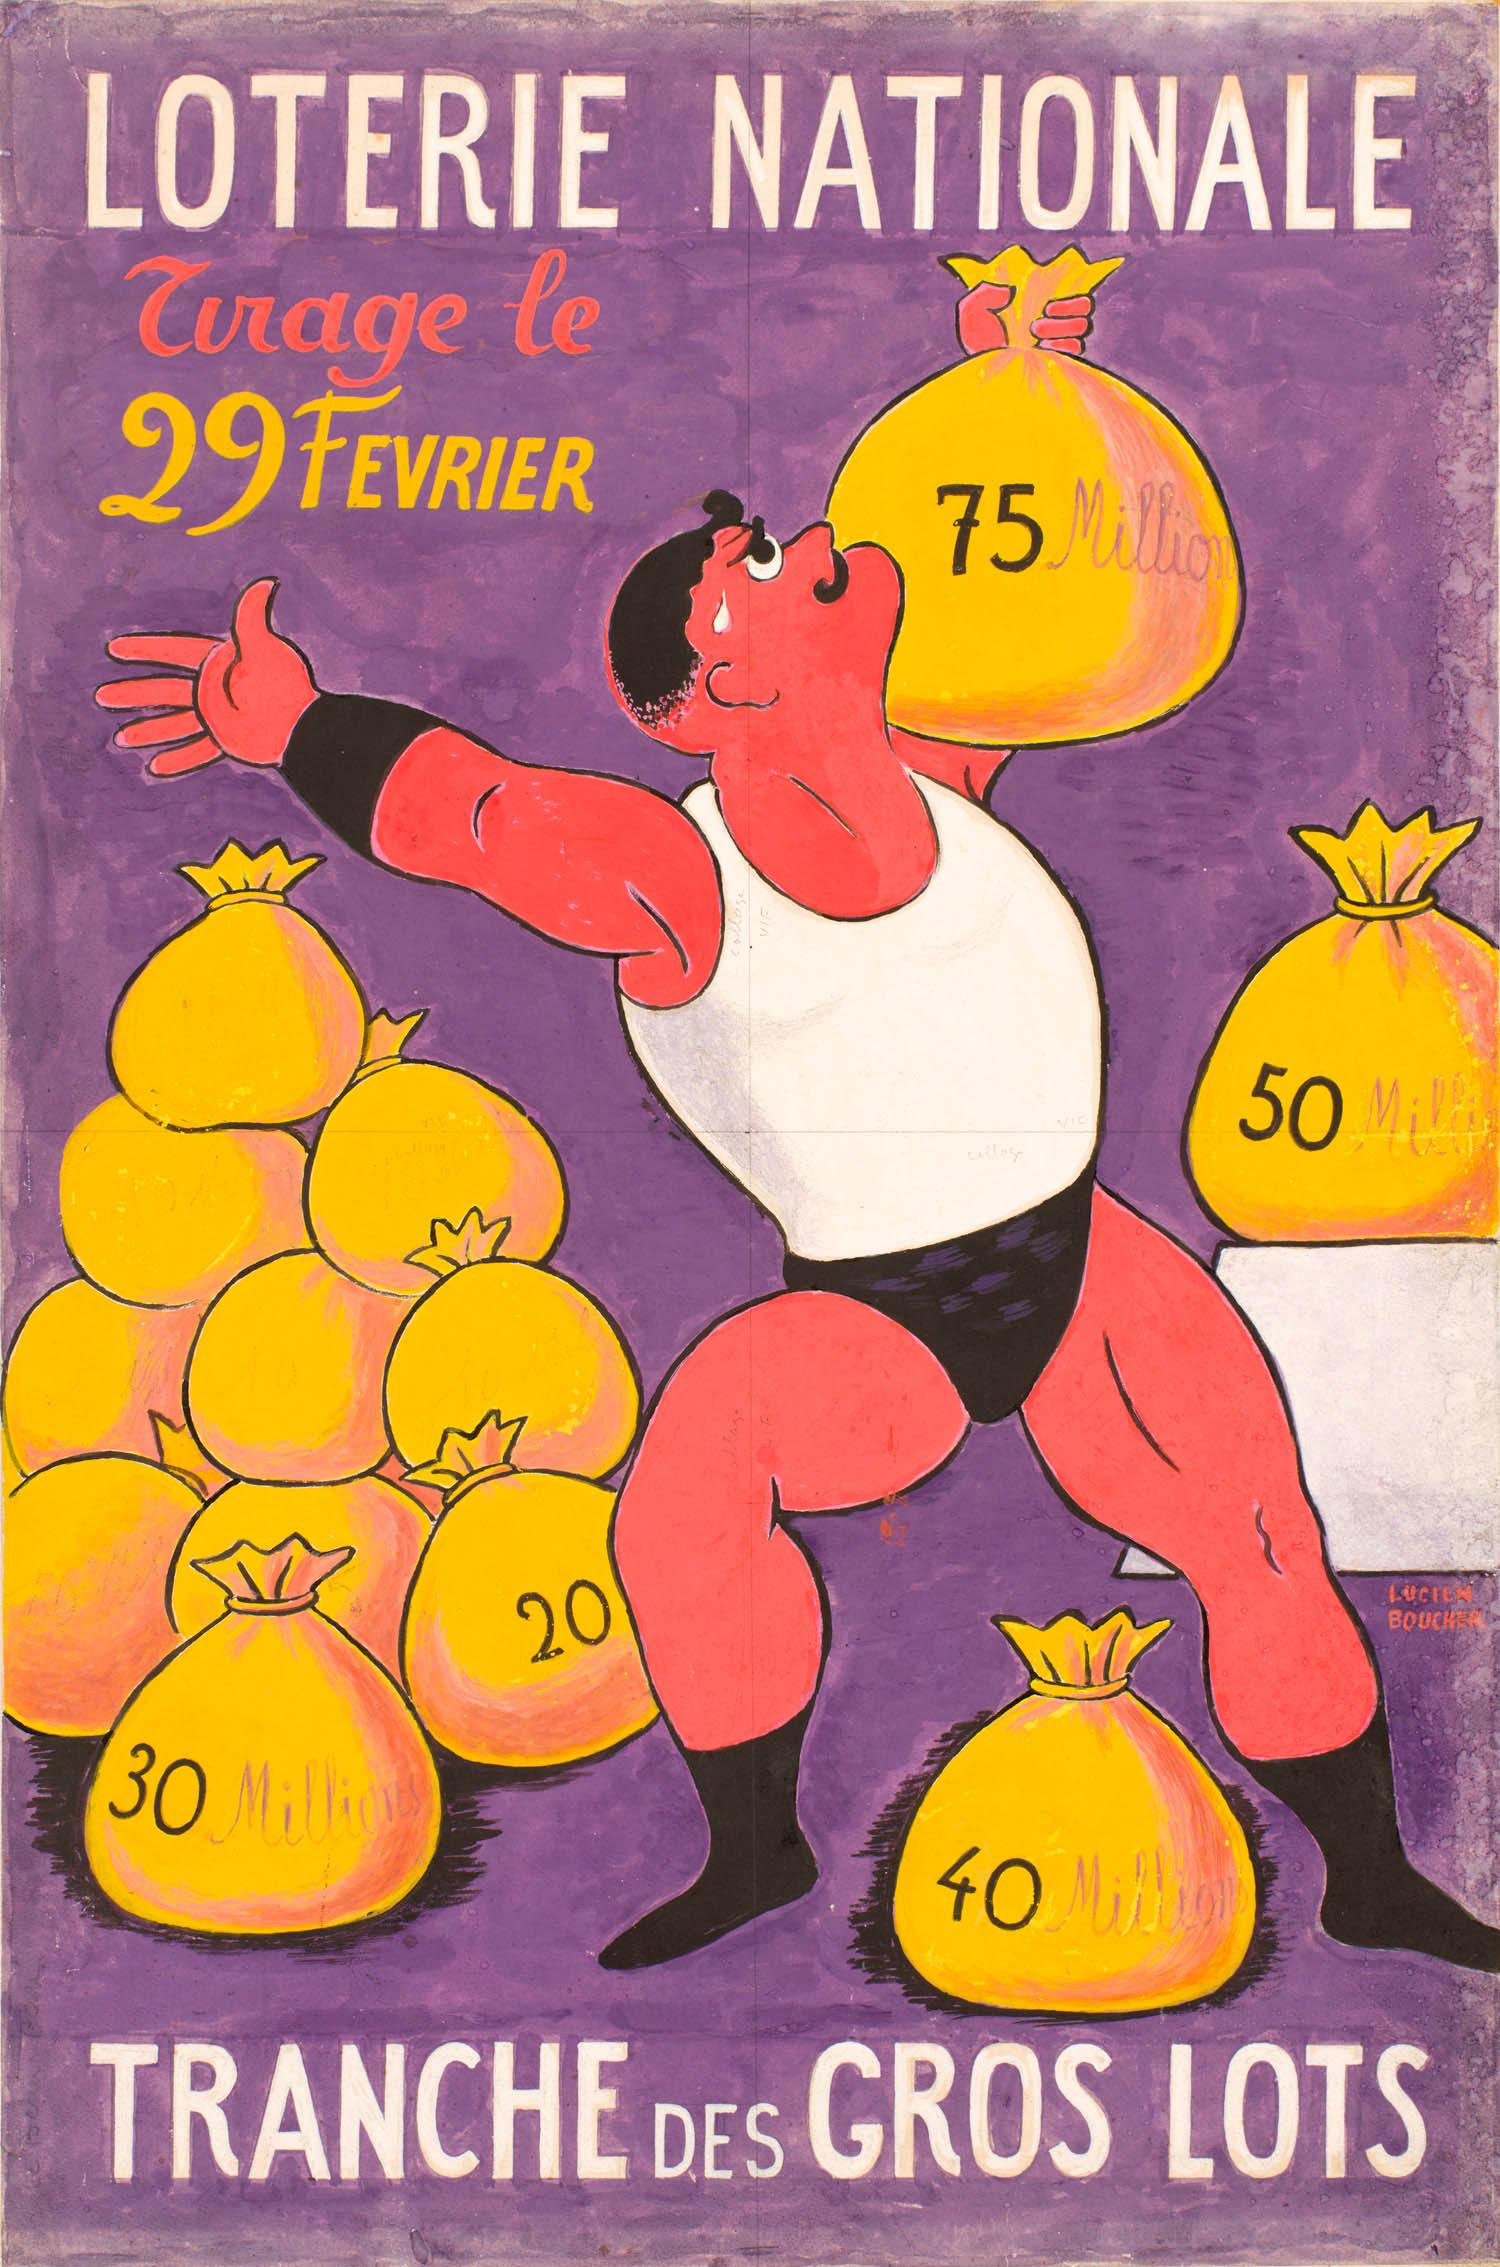 Lucien Boucher | Lucien Boucher | Loterie Nationale